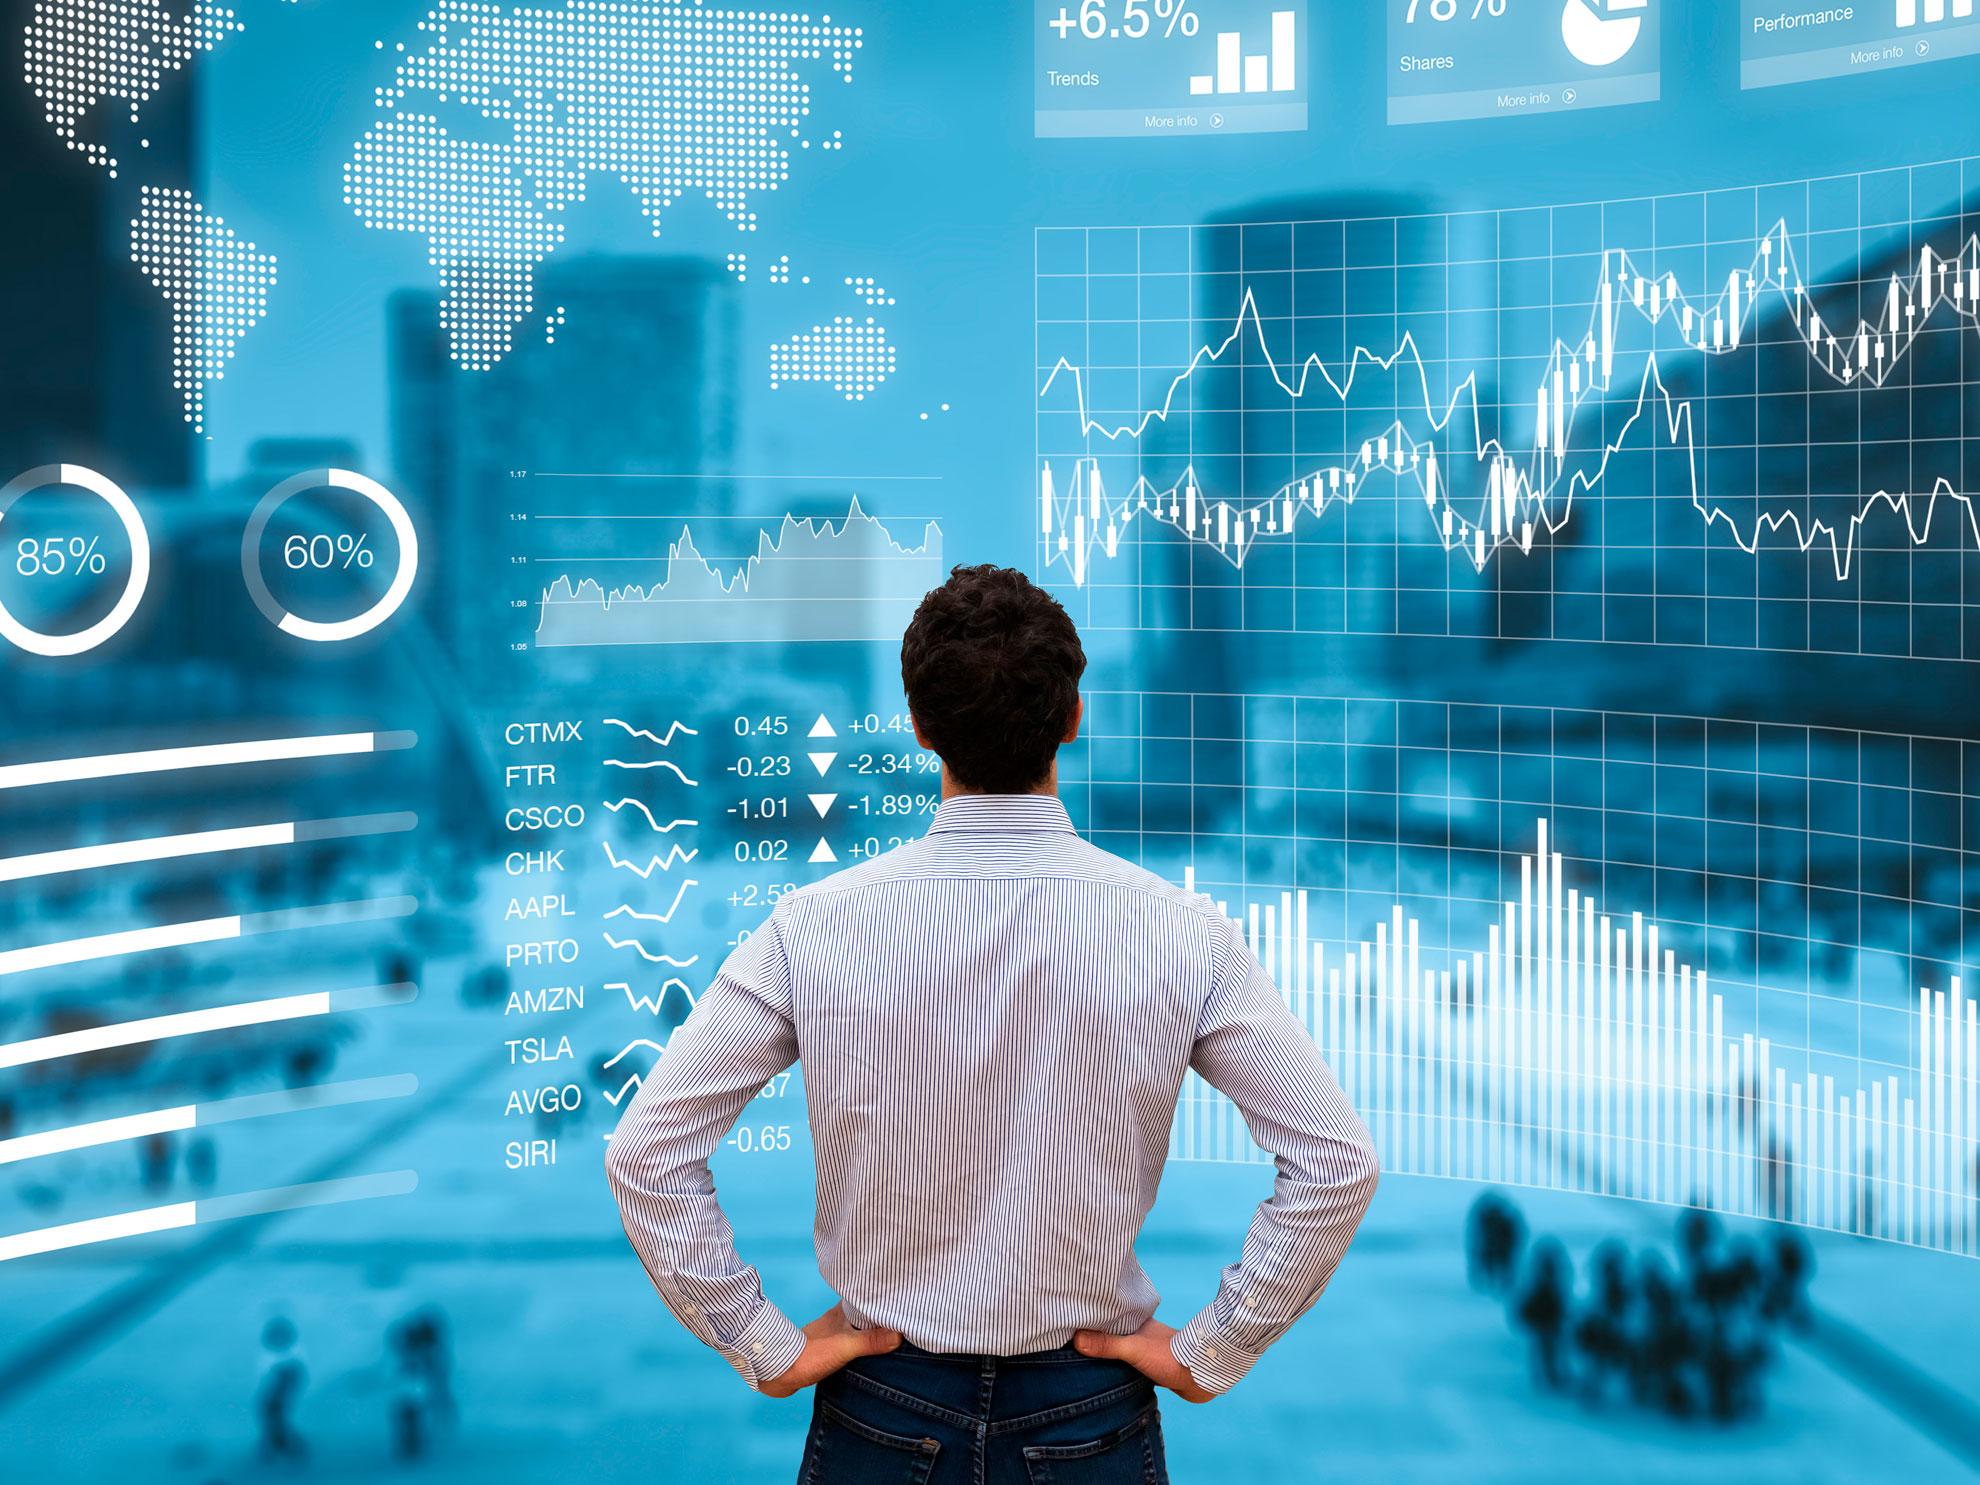 sistema-erp-per-performance-aziendale